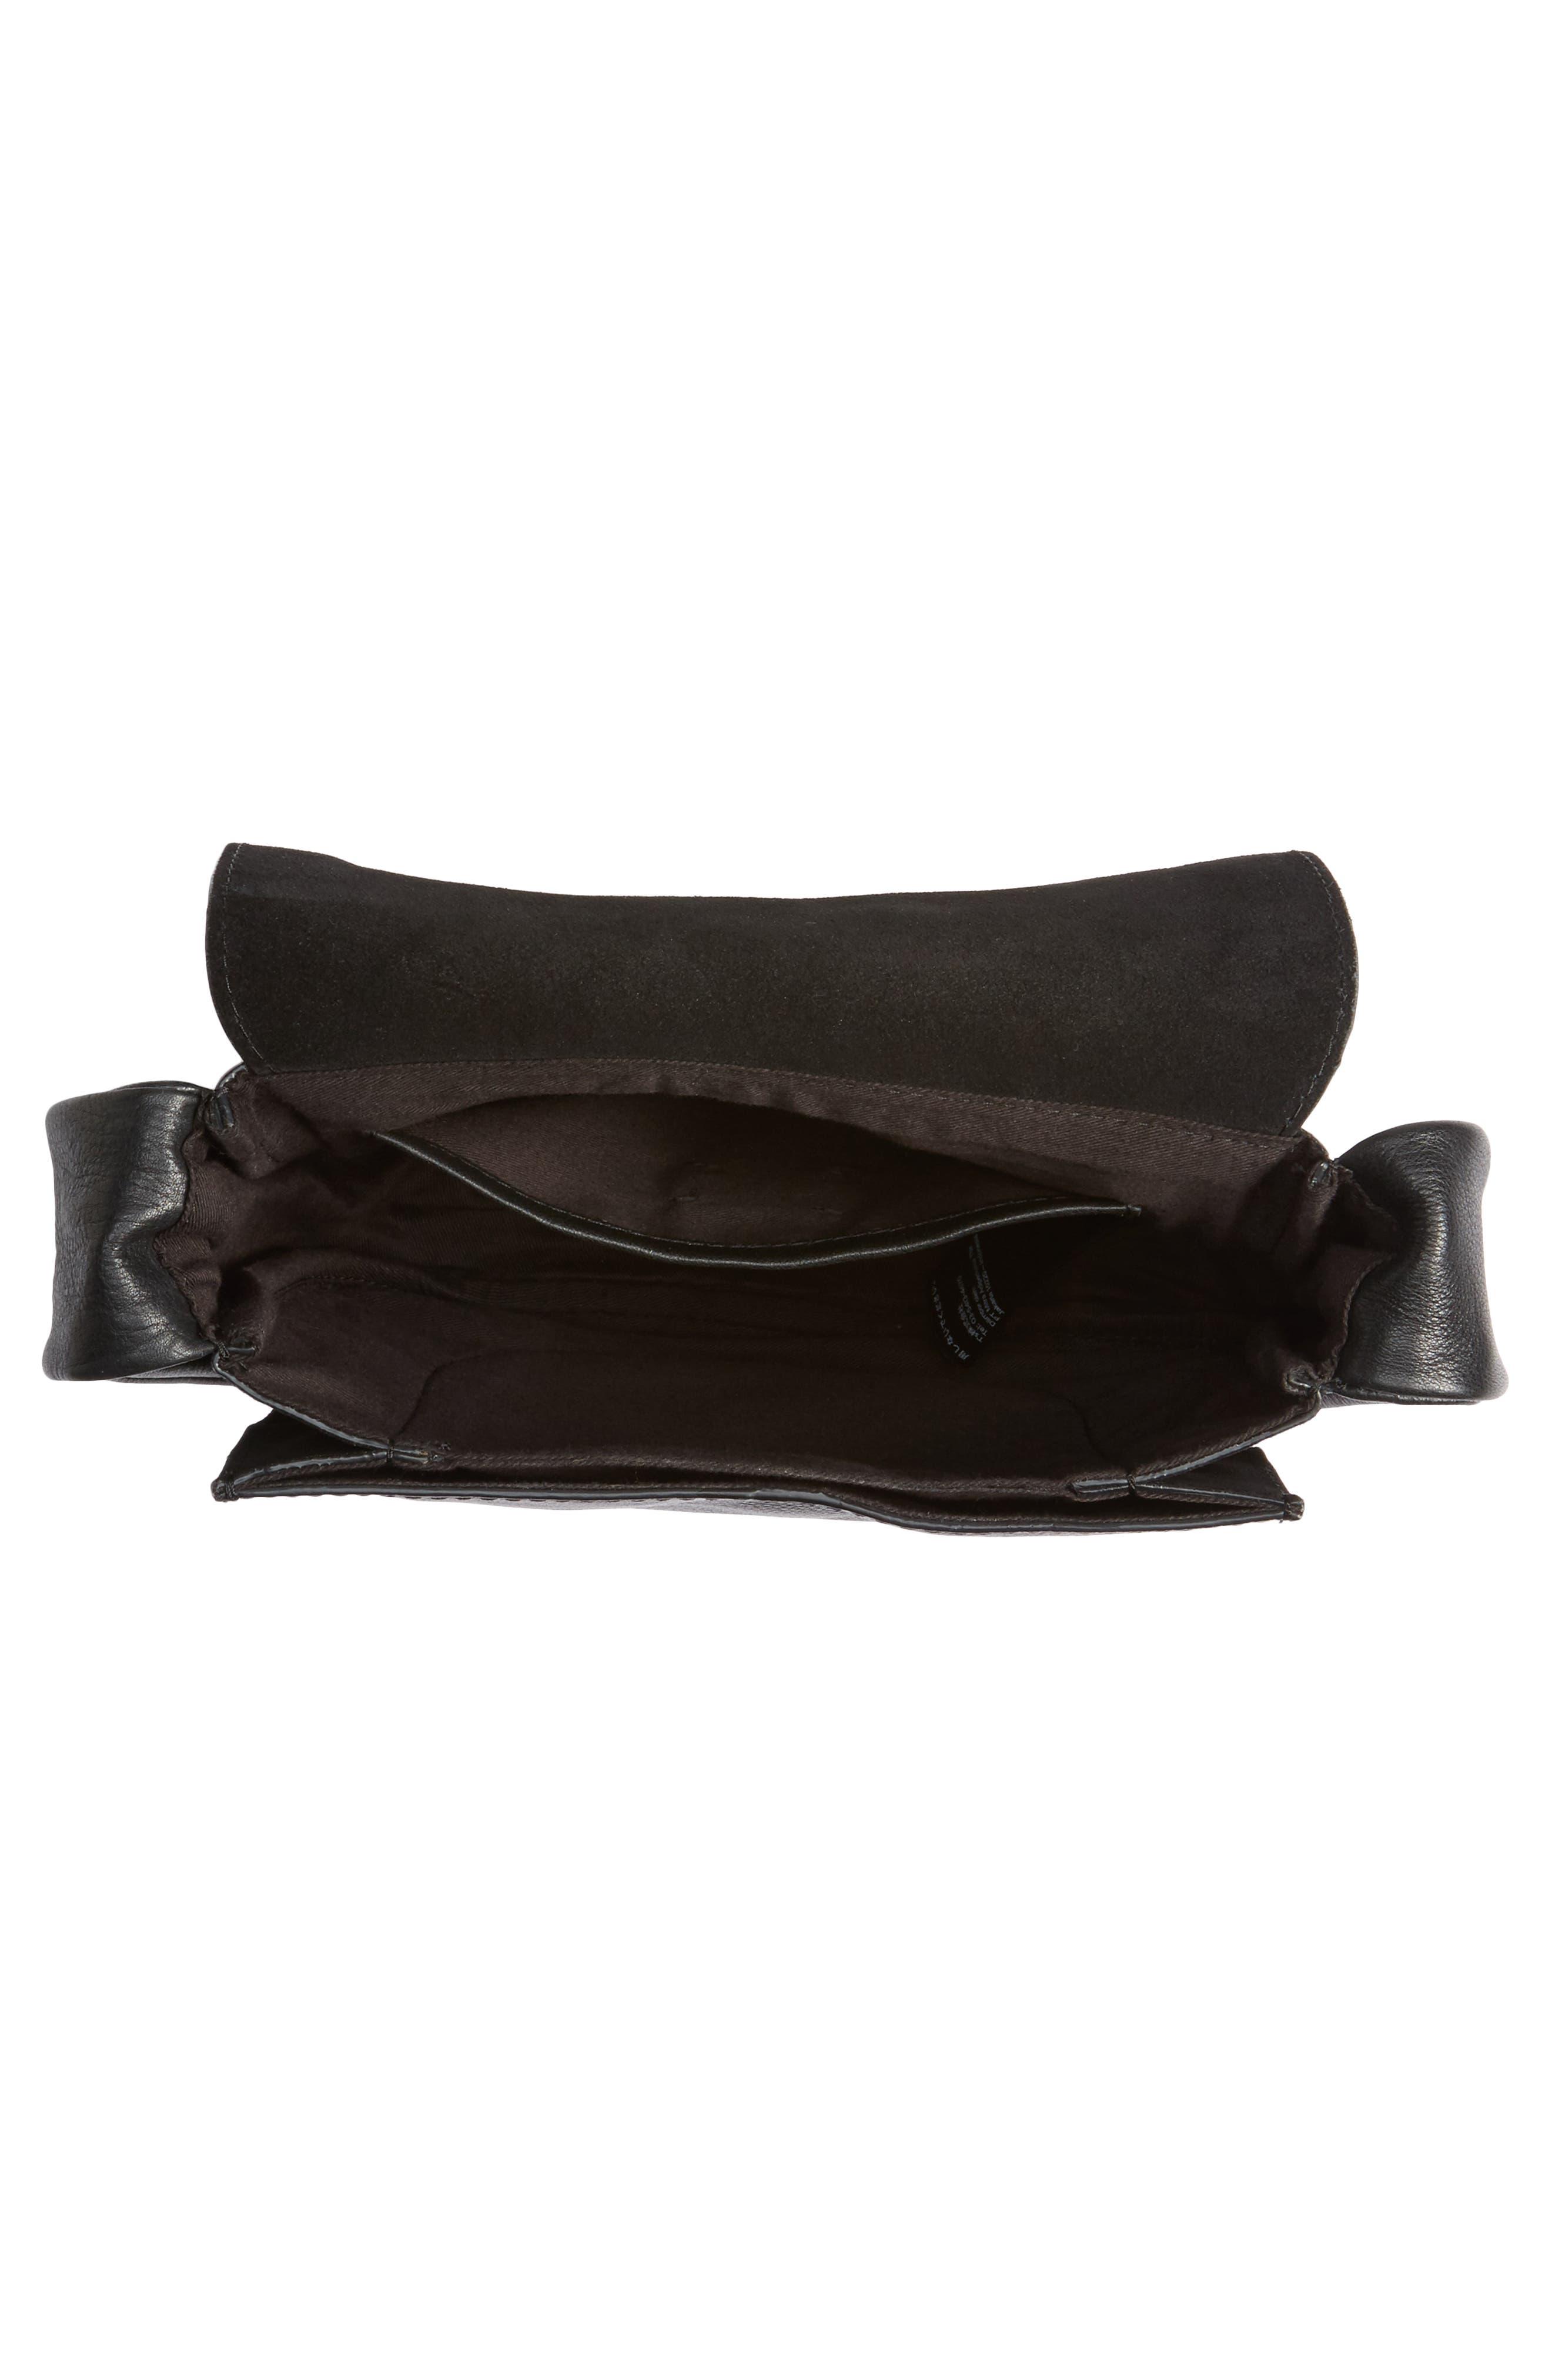 Jasmine Leather Saddle Bag,                             Alternate thumbnail 4, color,                             001